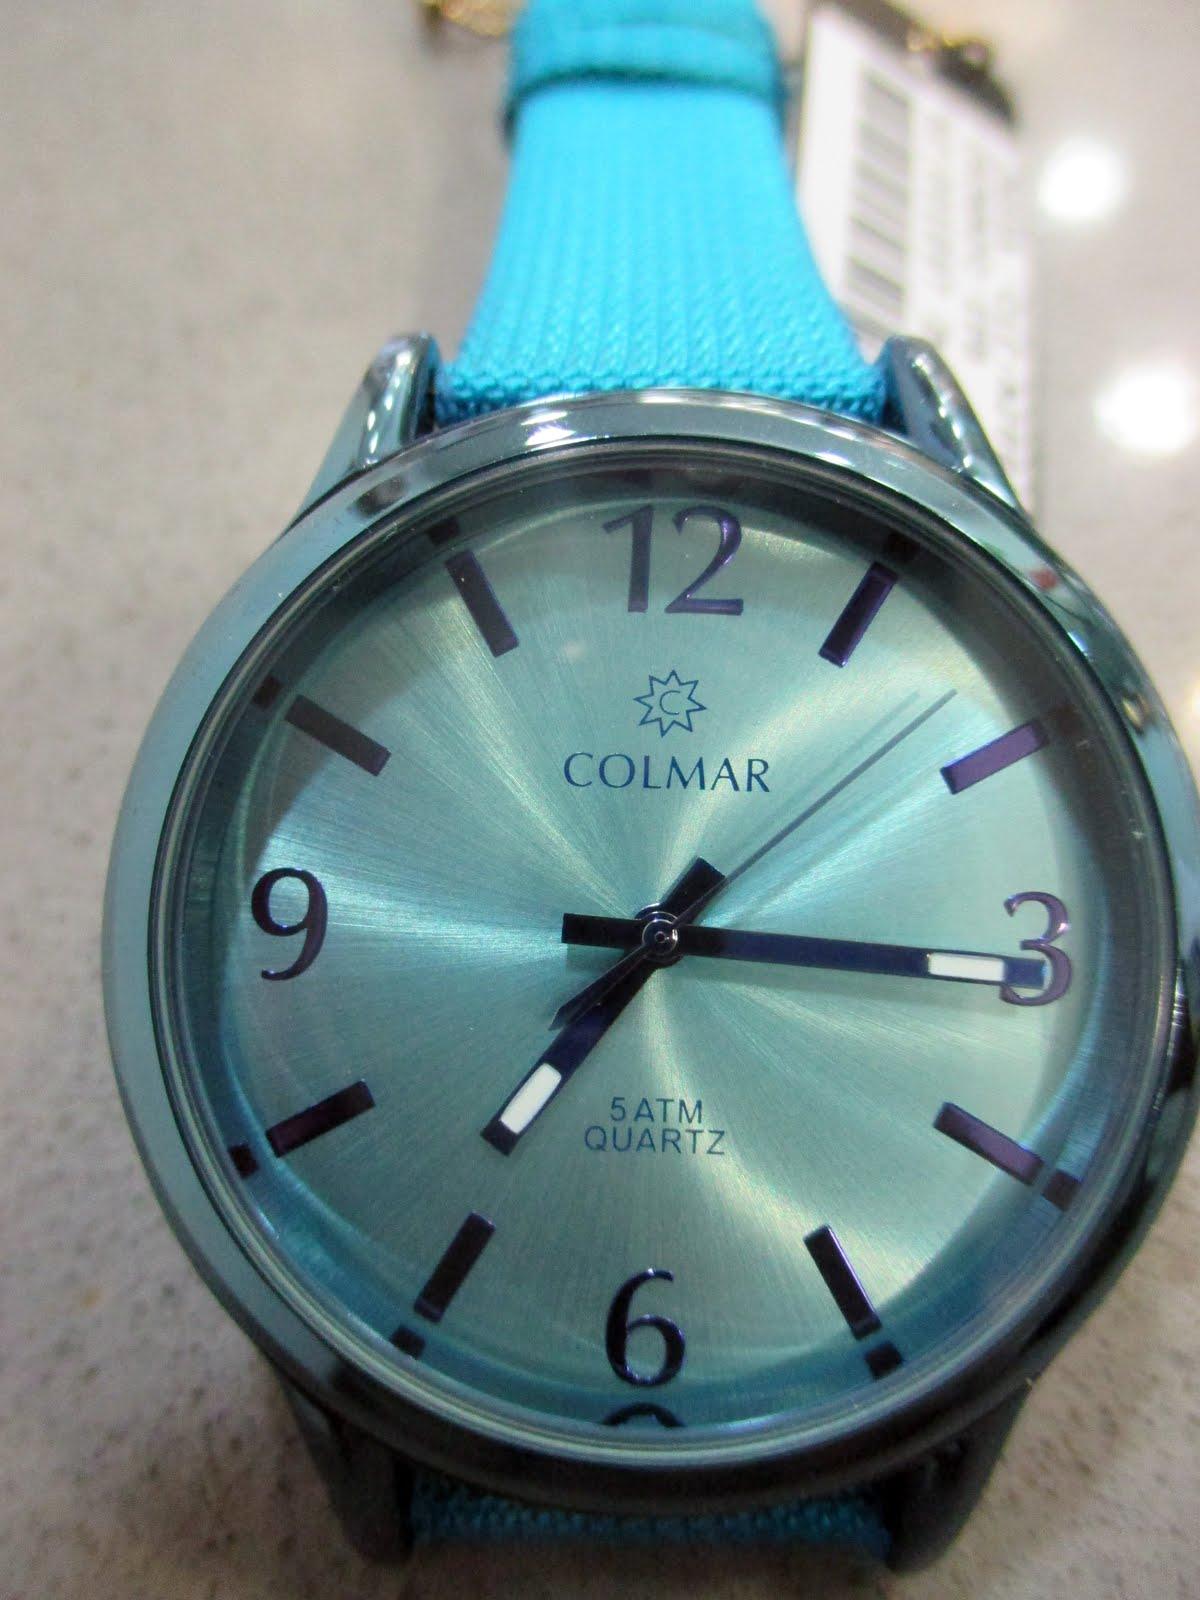 Reloj Colmar unisex, acuático